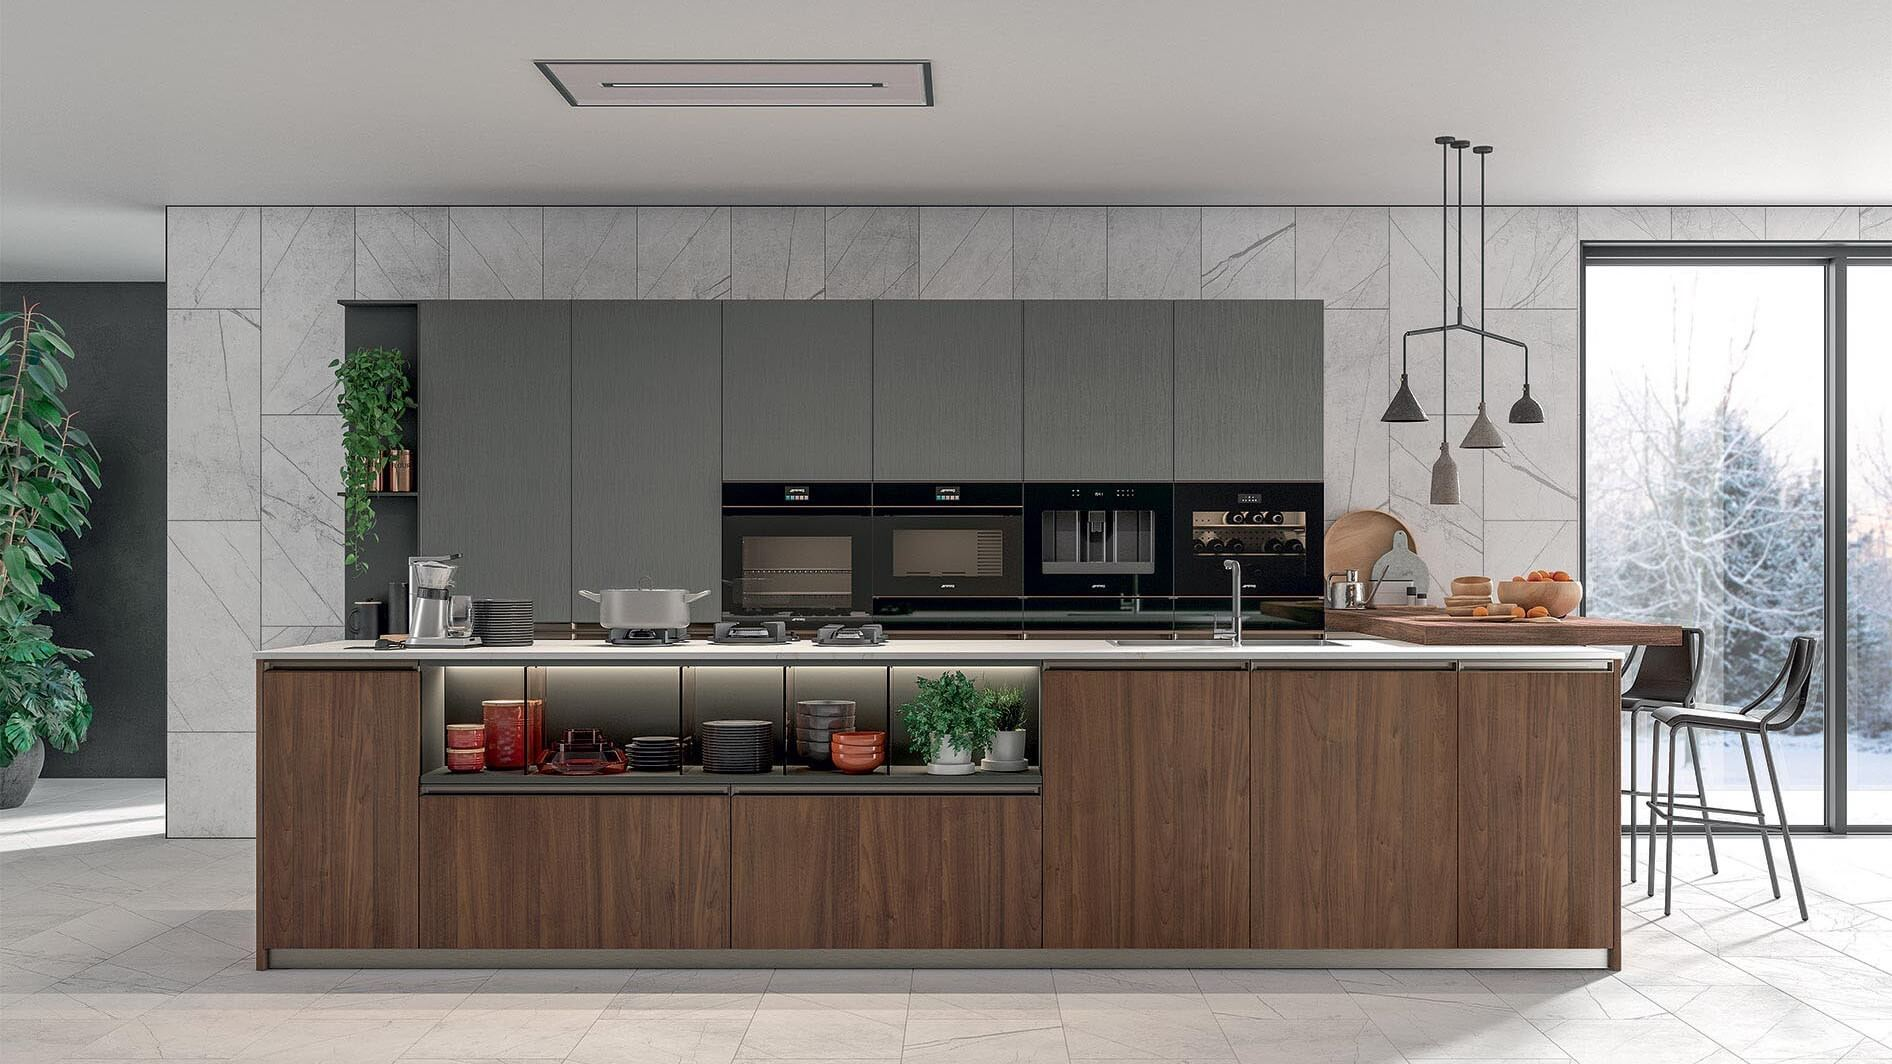 dynasty-membrane-kitchen-and-wardrobe-5